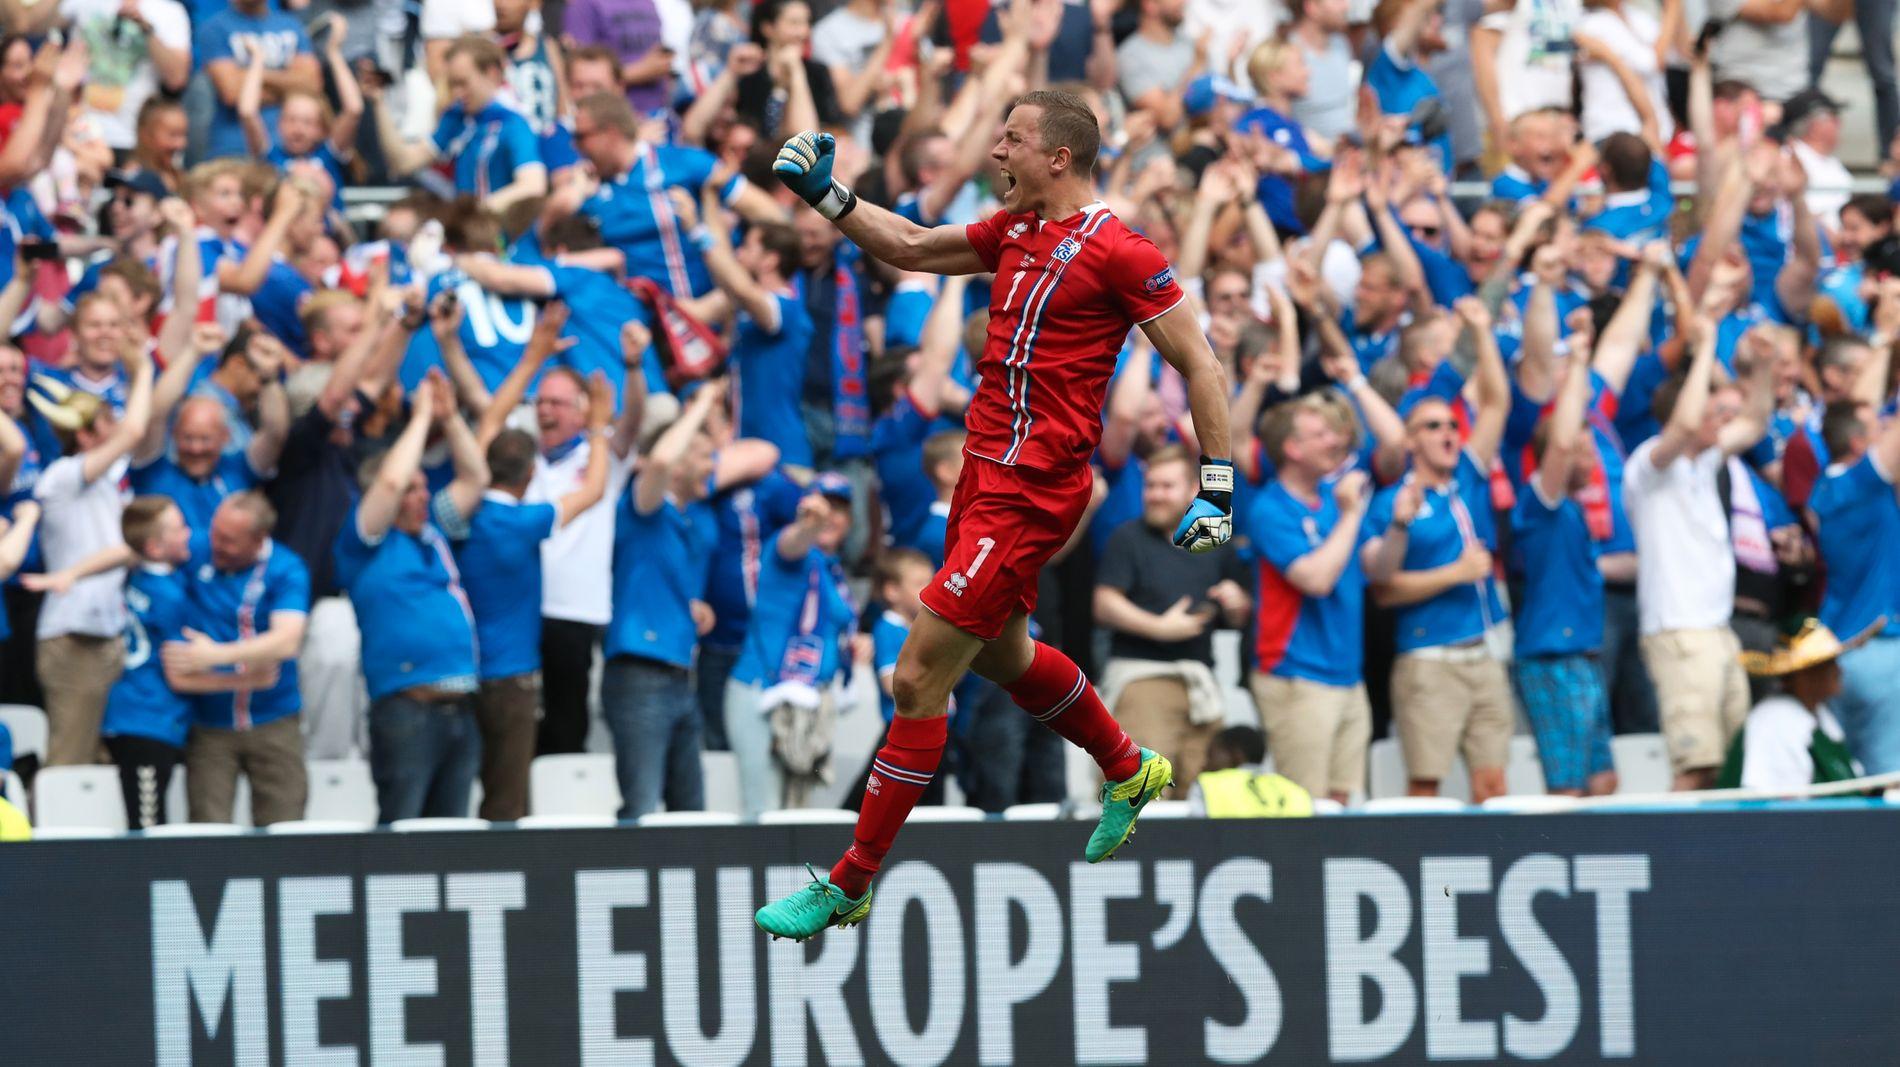 I EUROPATOPPEN: Hannes Halldorsson juber for Islands 1-0-mål mot Ungarn på Stade Velodrome.